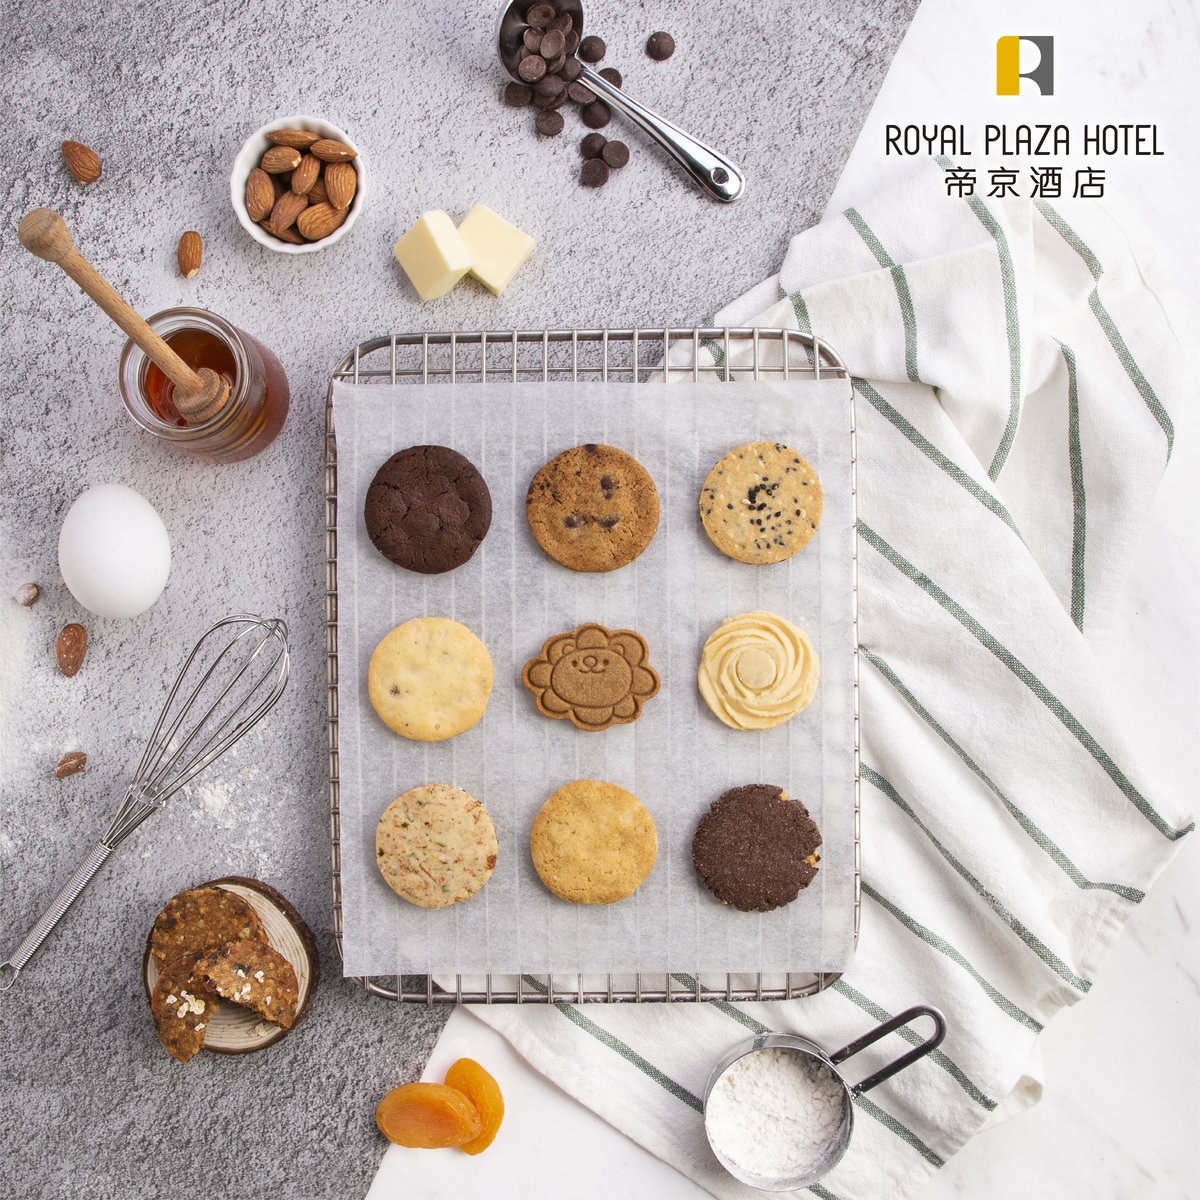 1 Unit - Oatmeal, Apricot & Raisin Cookies (10 pcs)【Self Pick-up Only】